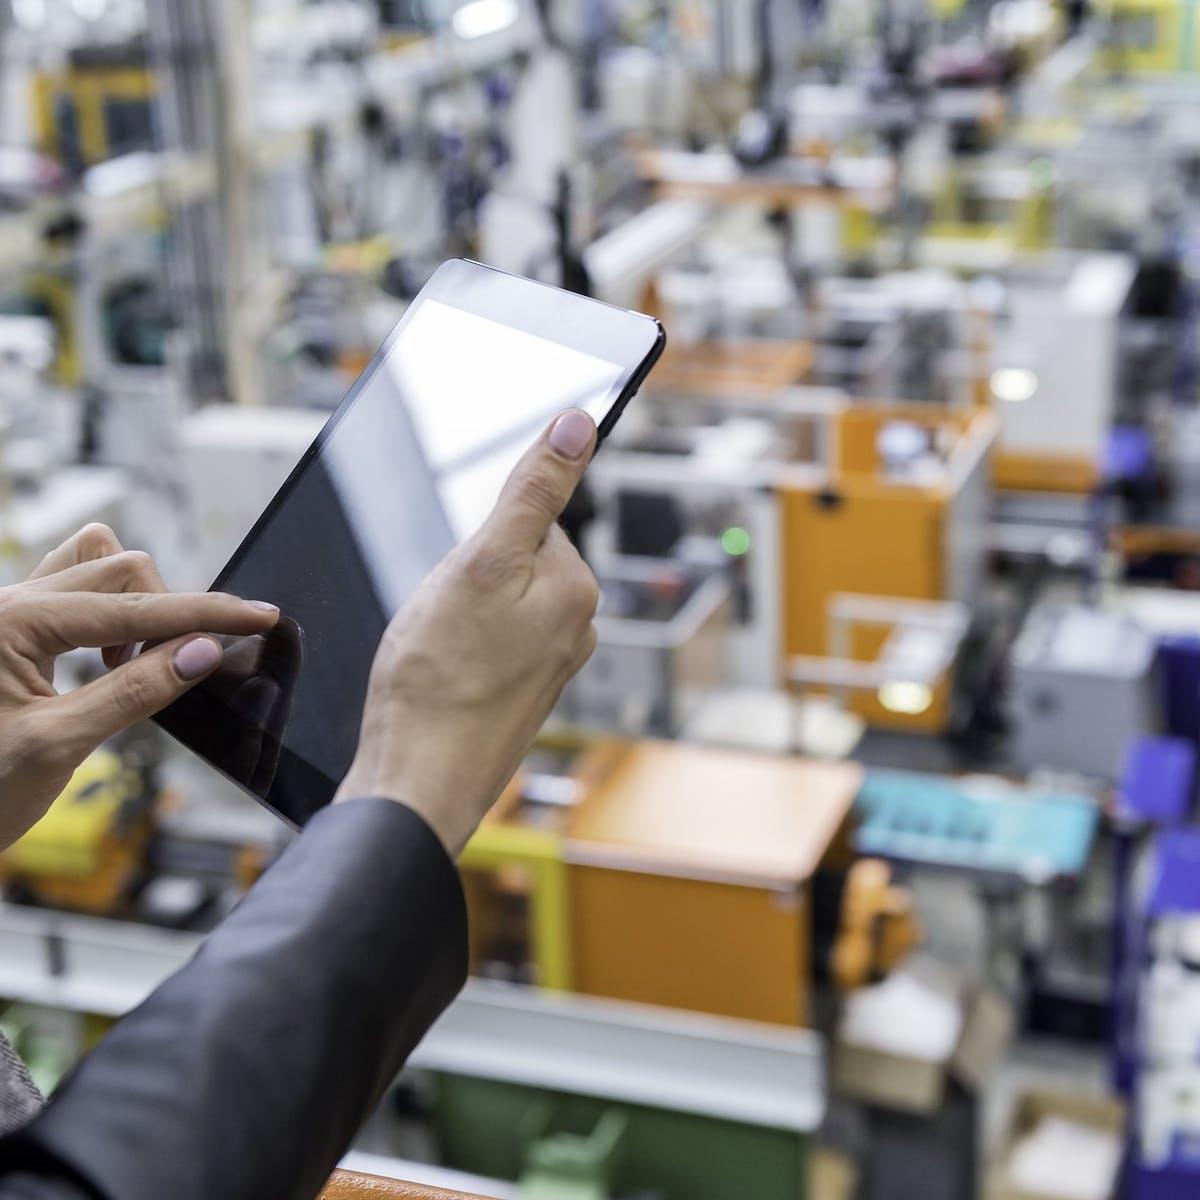 Hand bedient Tablet in Fabrik